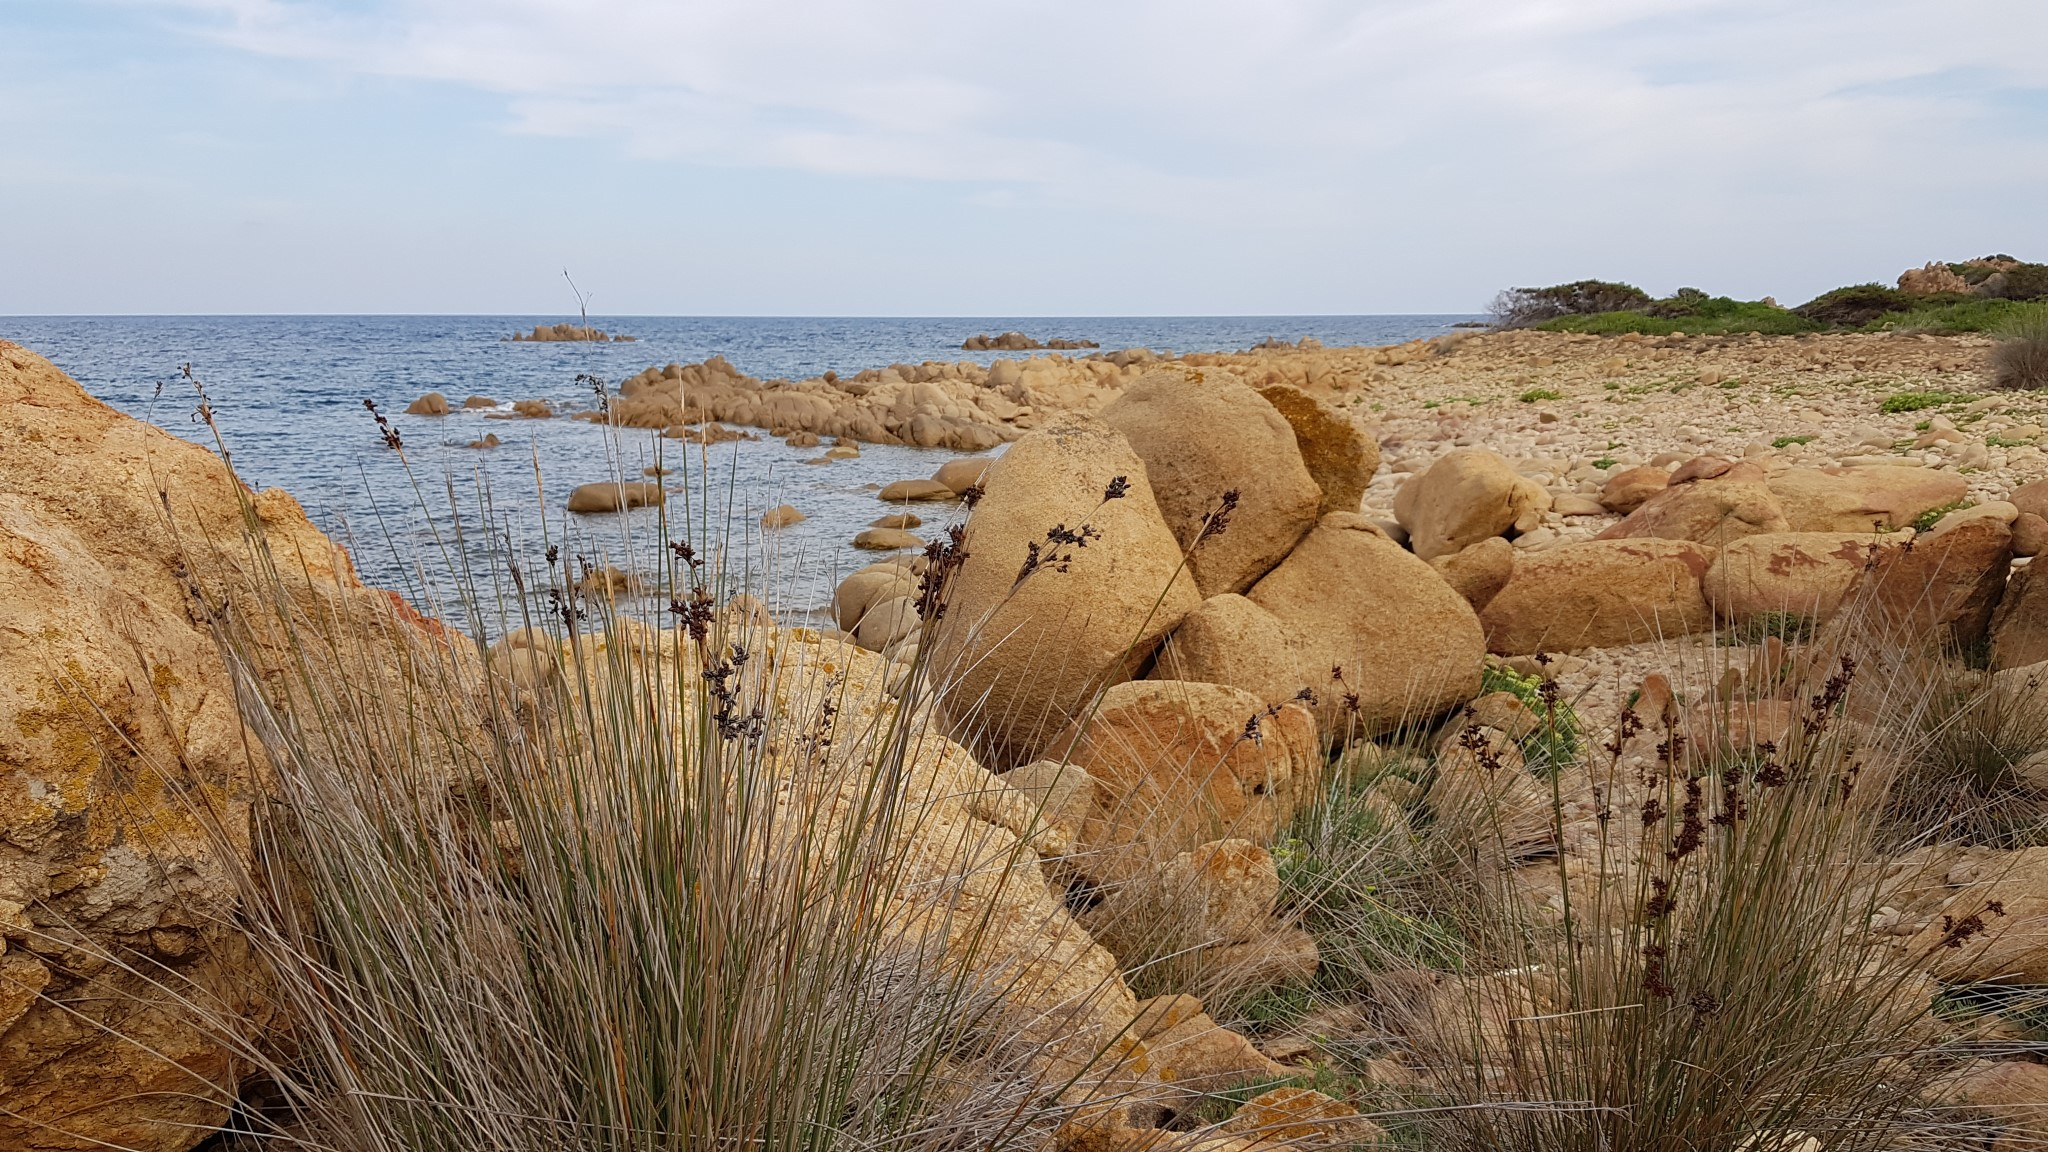 rocky beach with reeds on the coast of Sardinia, Capo Comino